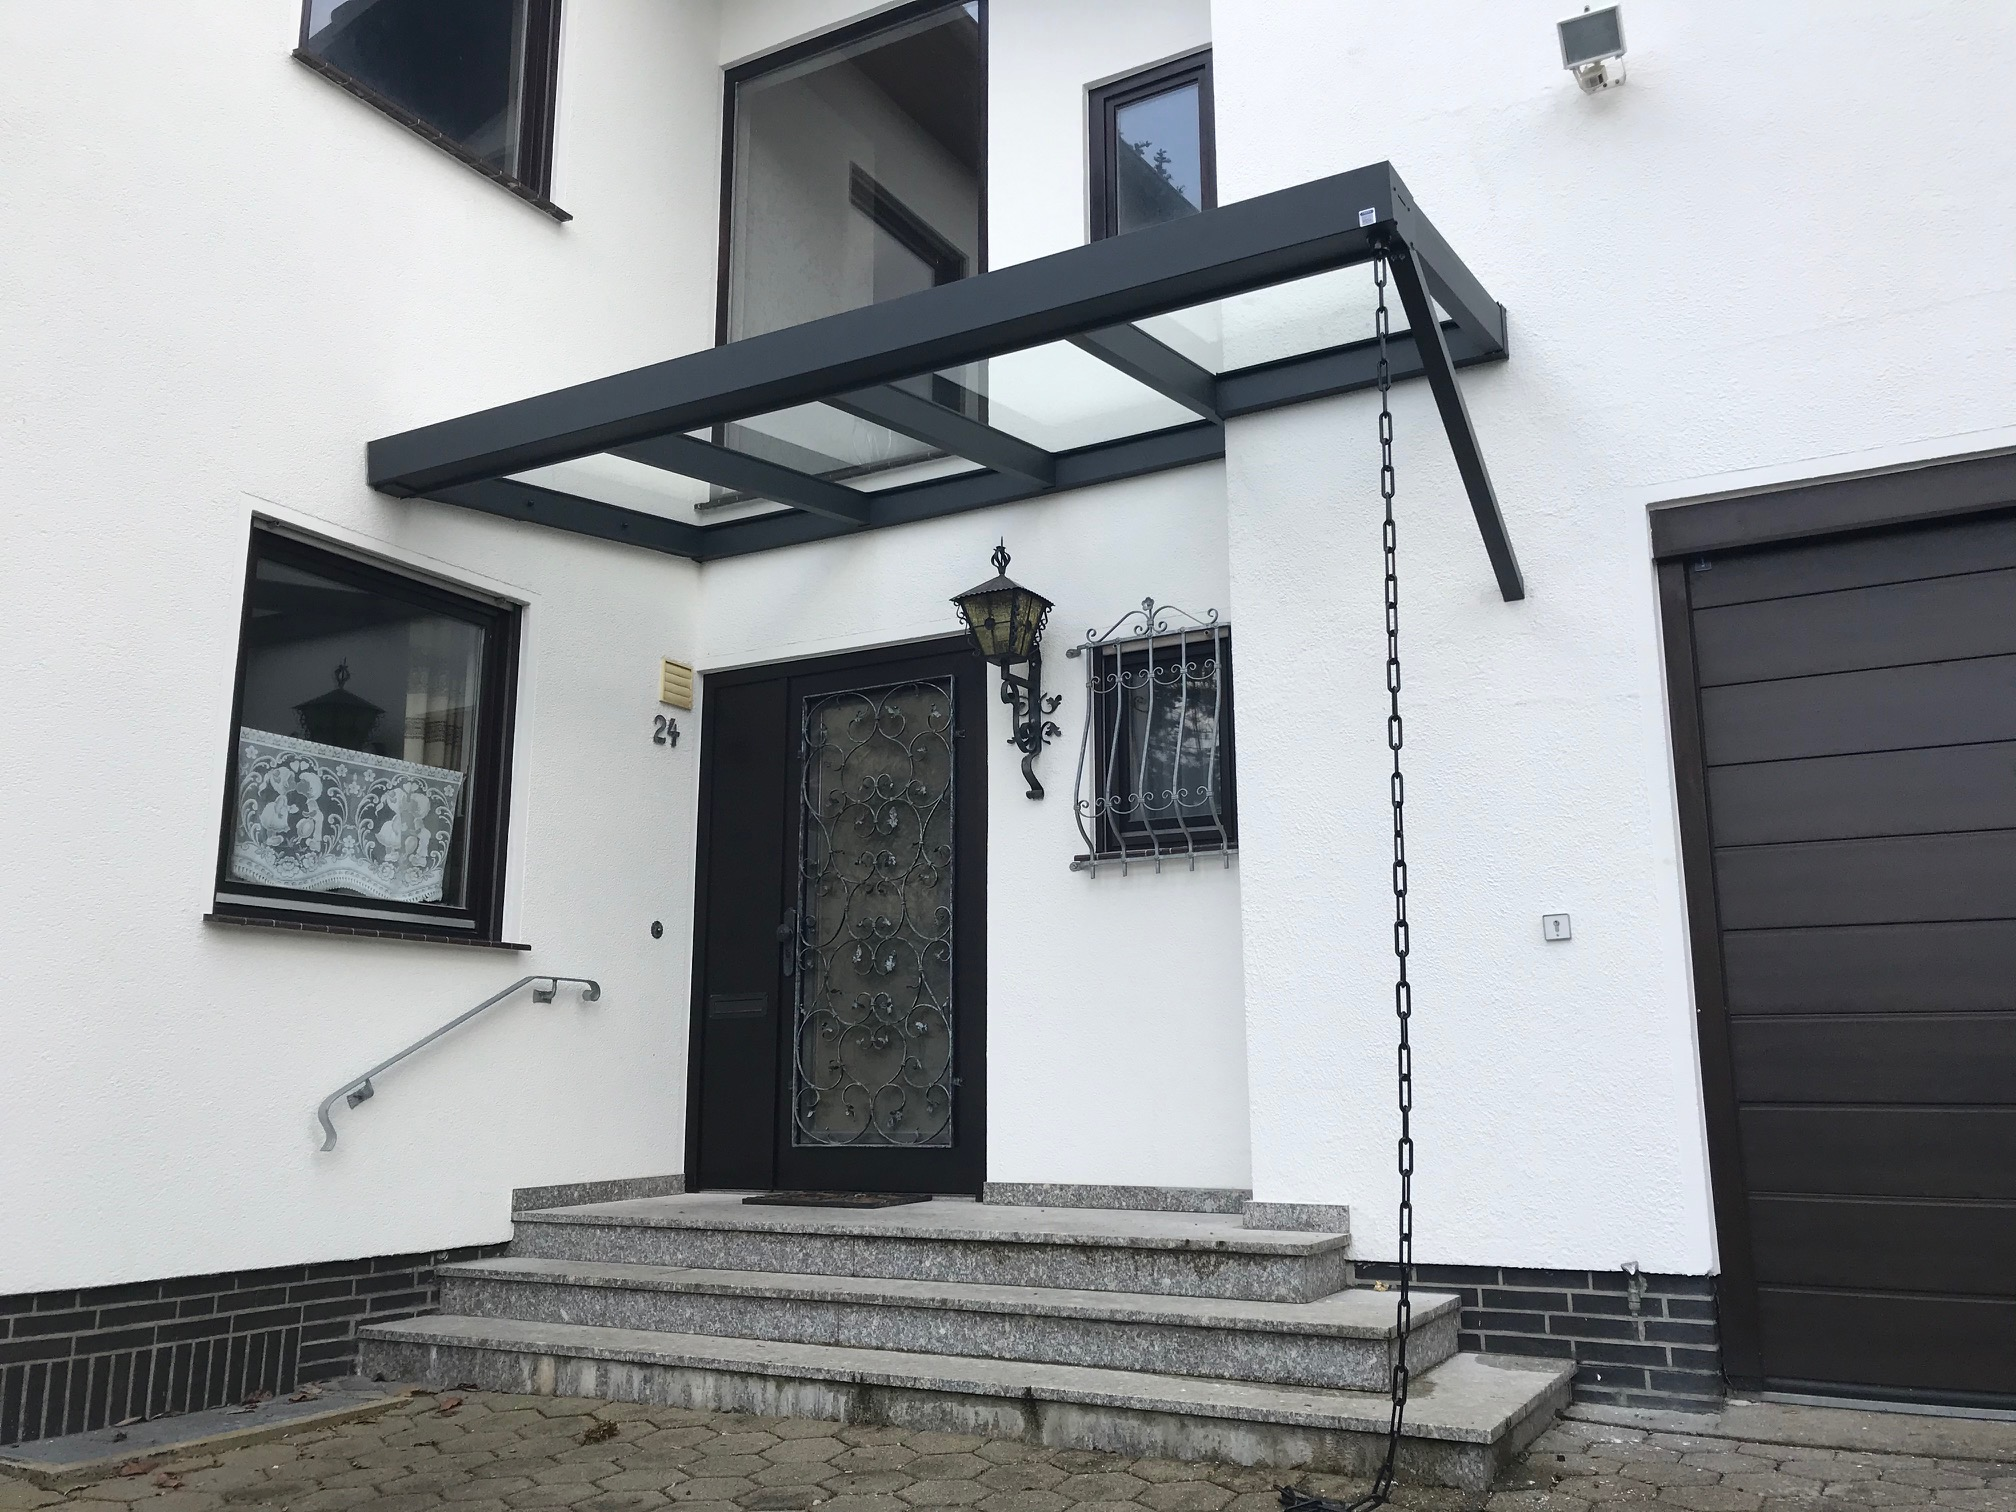 Haustür-Überdachung